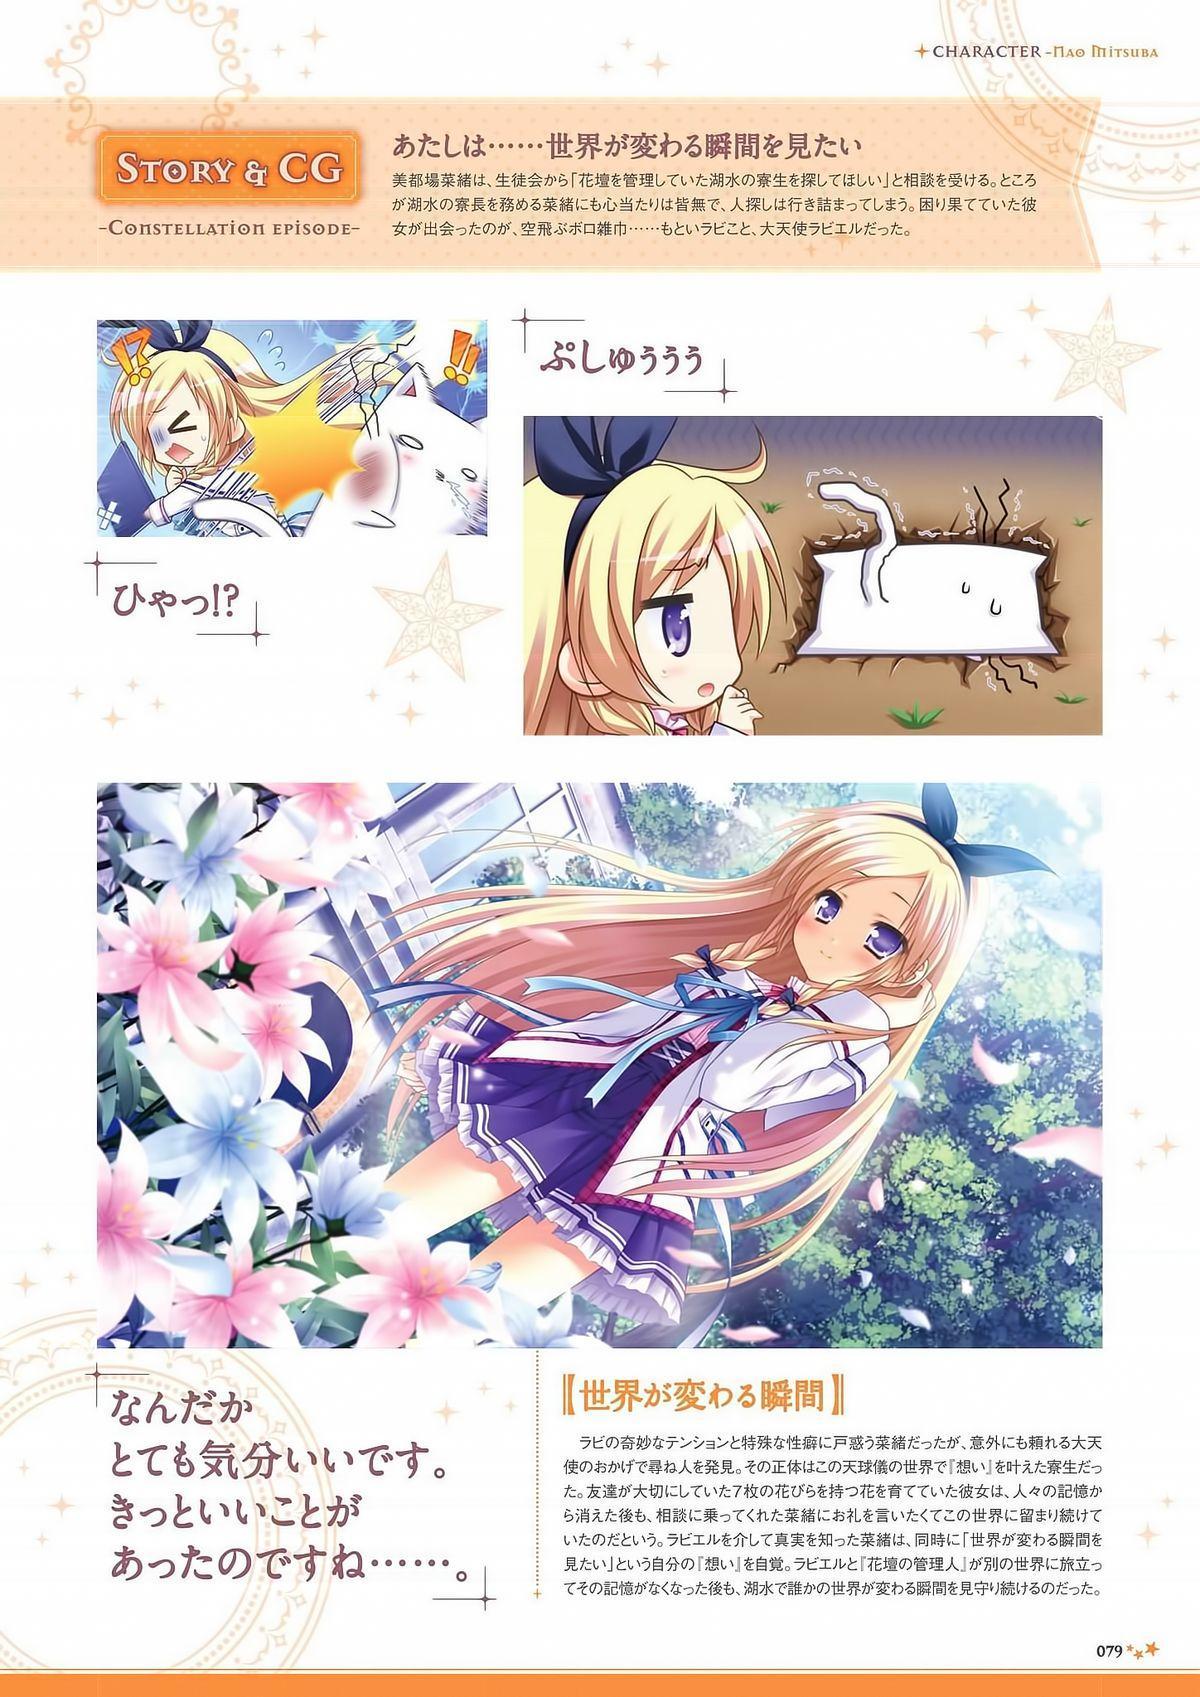 Sekai to Sekai no Mannaka de Visual Fanbook 79